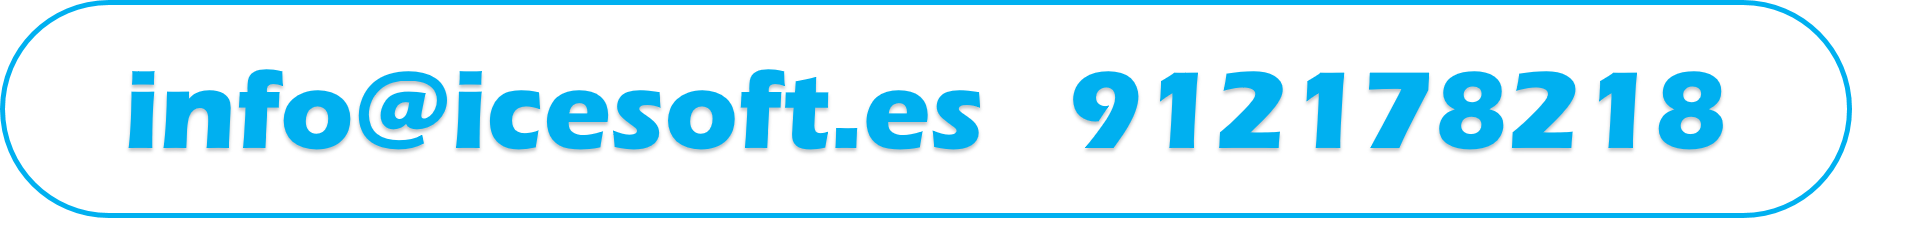 Contacto departamento comercial ICESOFT